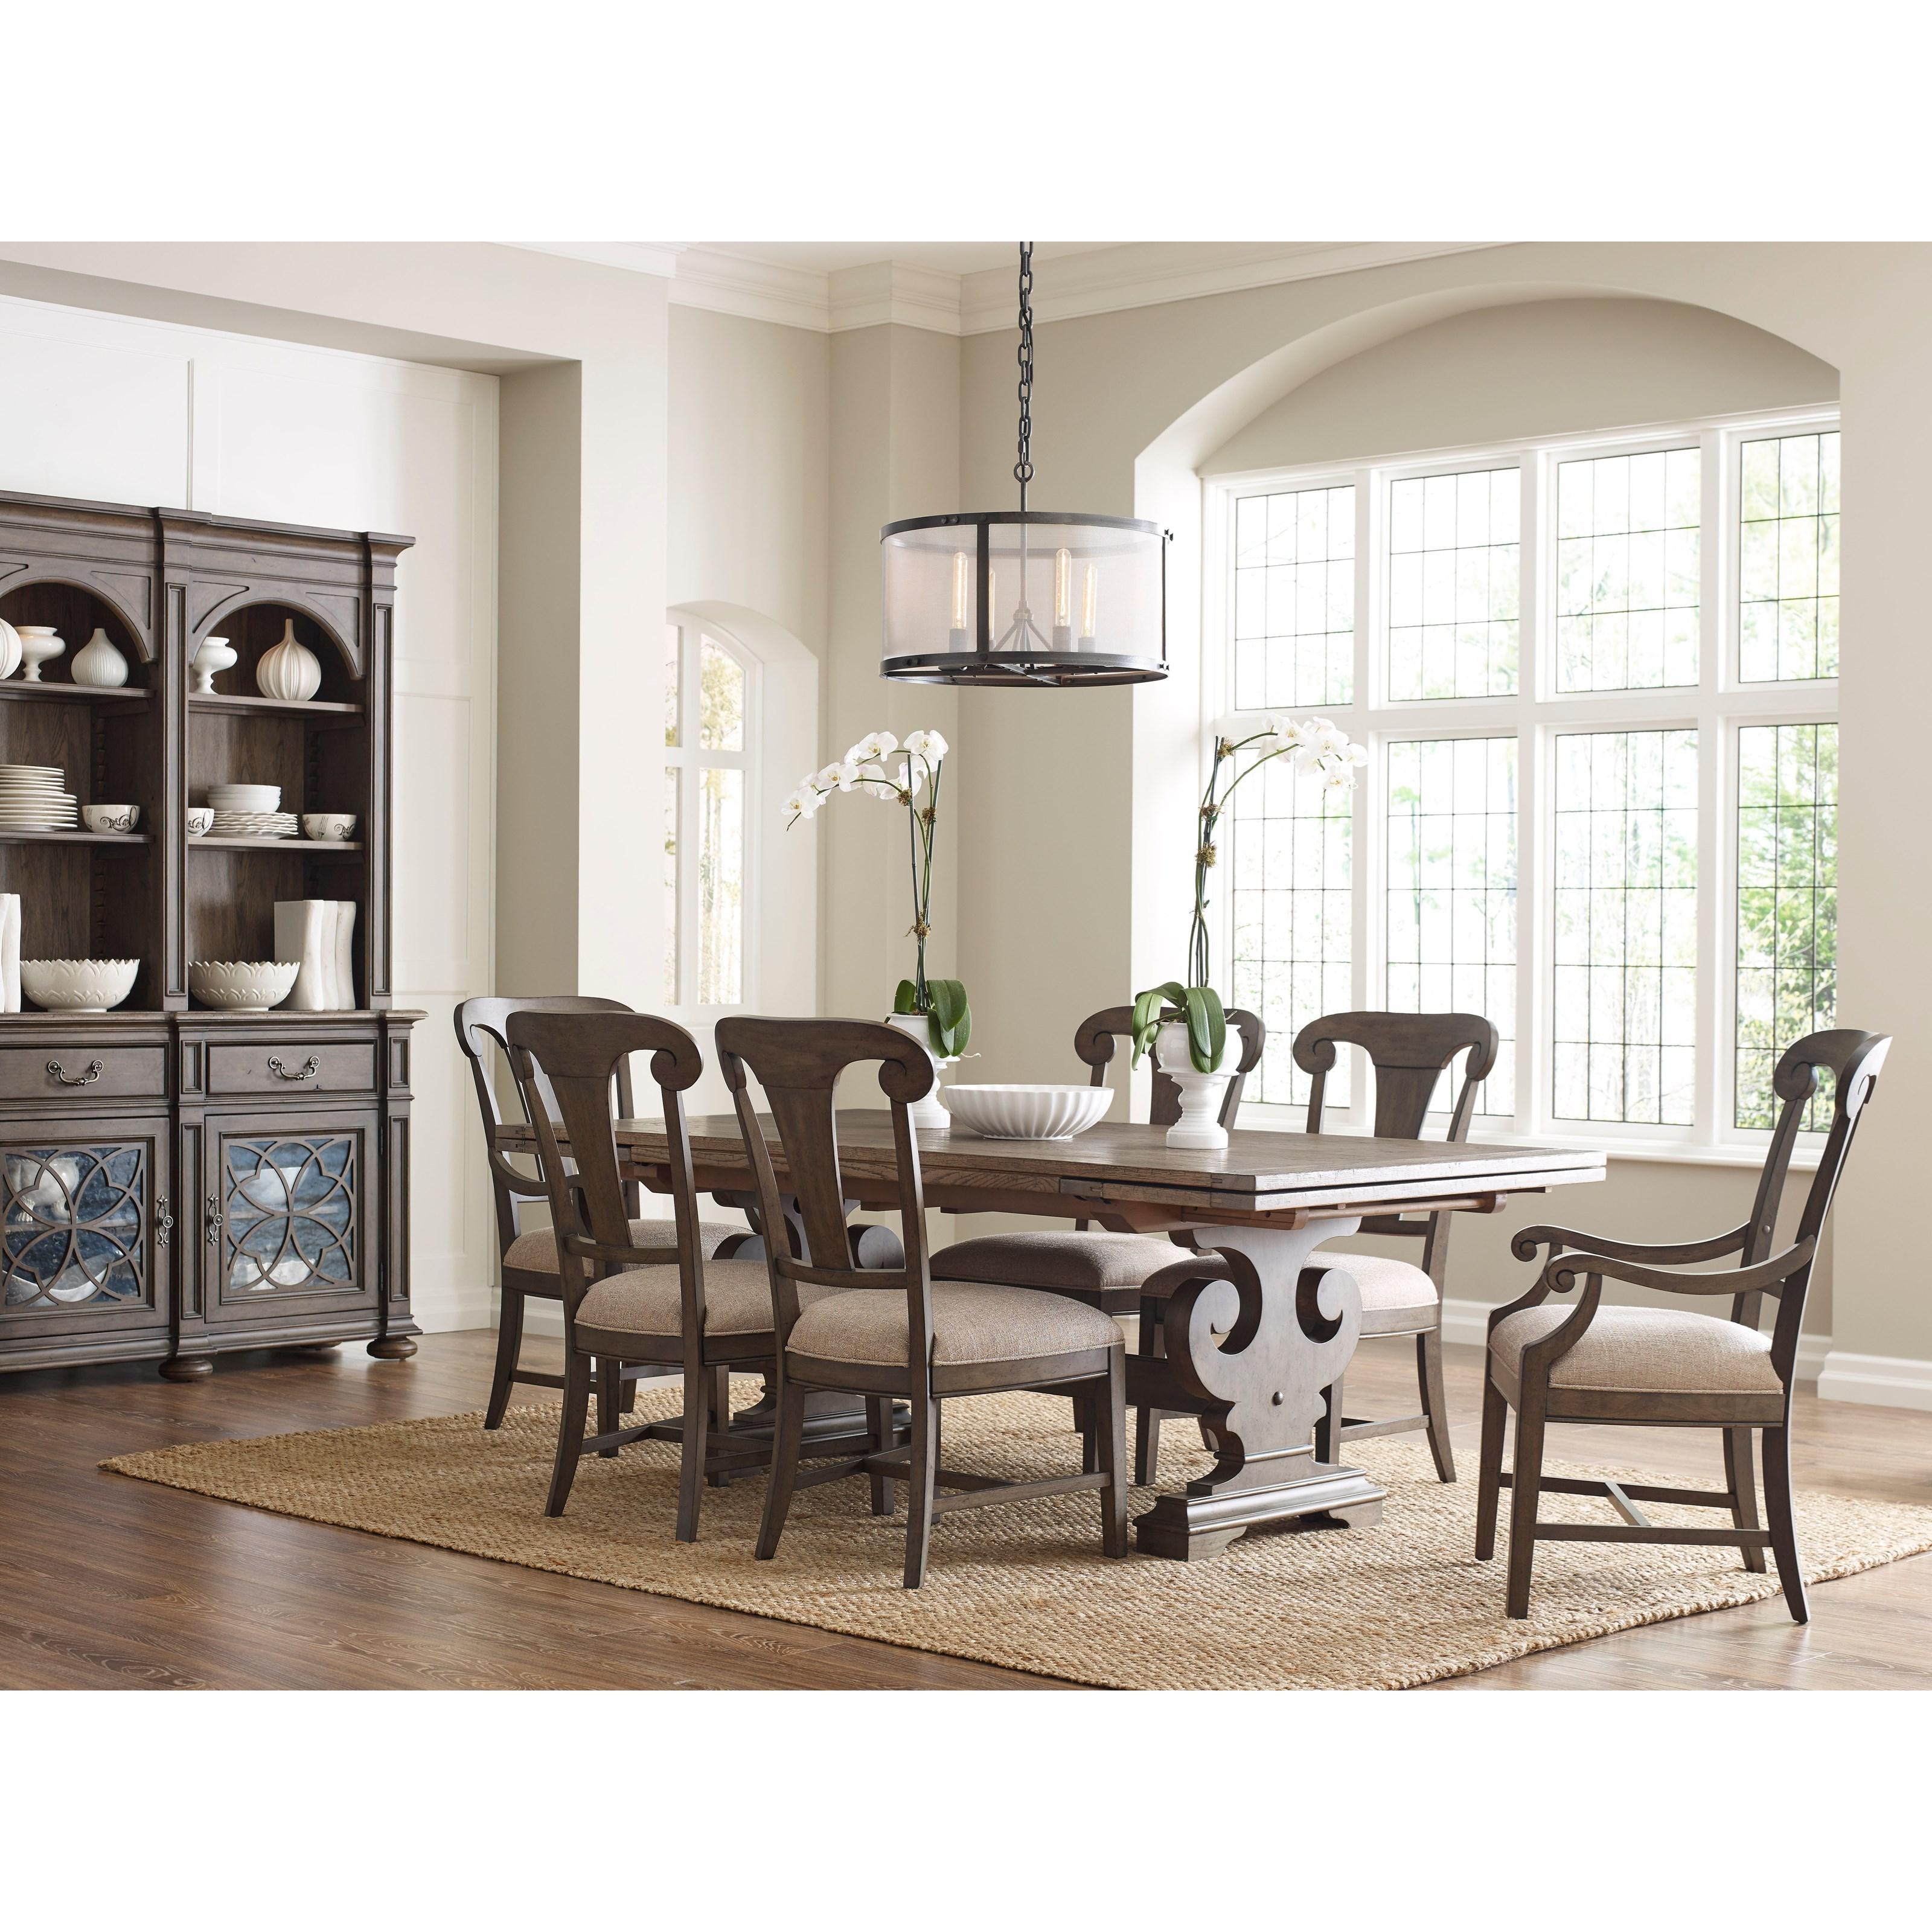 Kincaid Furniture GreysonFormal Dining Room Group